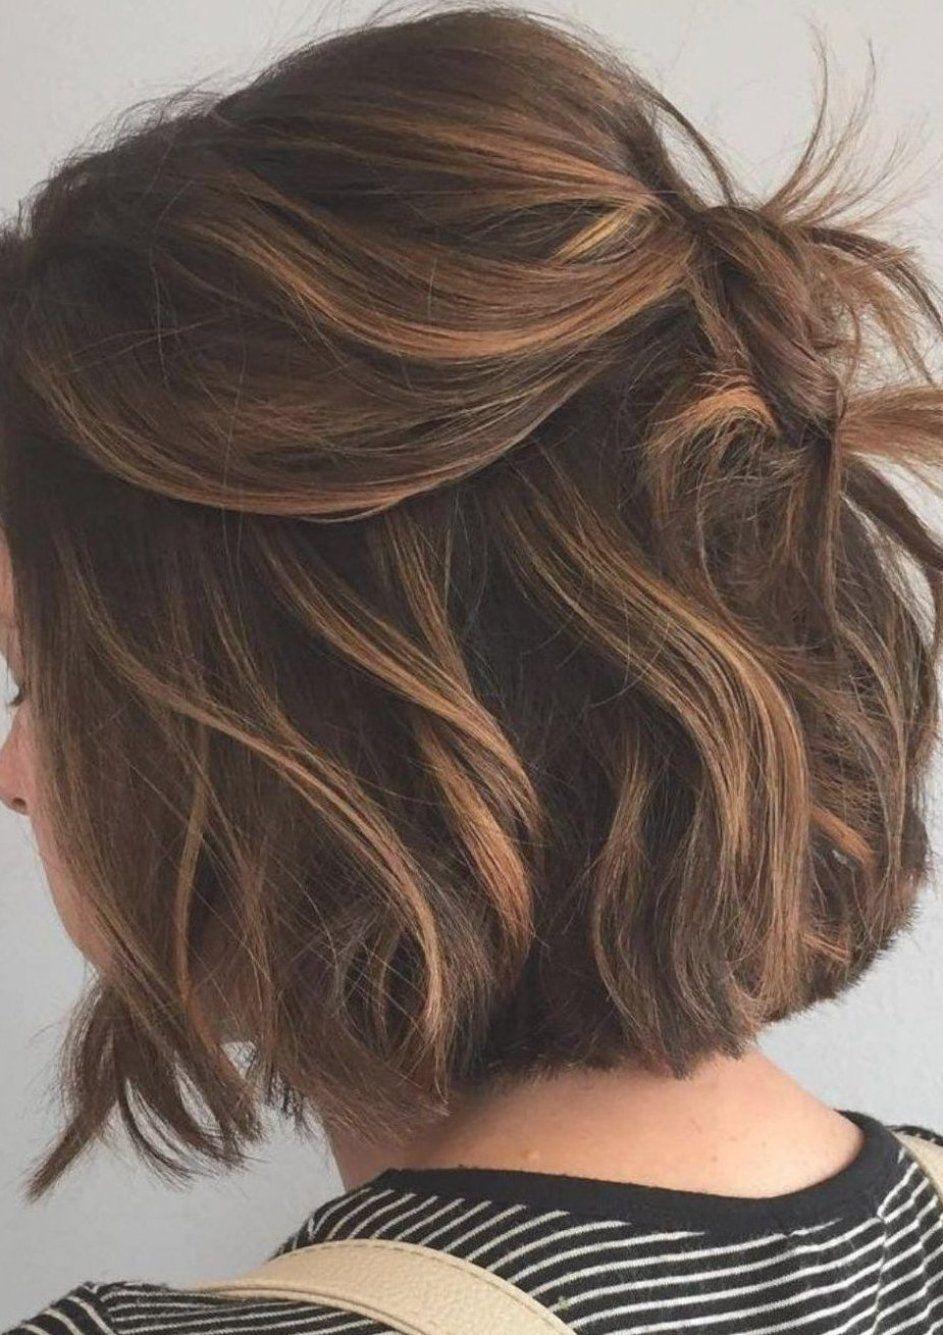 28 Incredible Examples Of Caramel Balayage On Short Dark Brown Hair Car In 2020 Dark Hair With Highlights Brown Hair With Highlights And Lowlights Short Hair Balayage